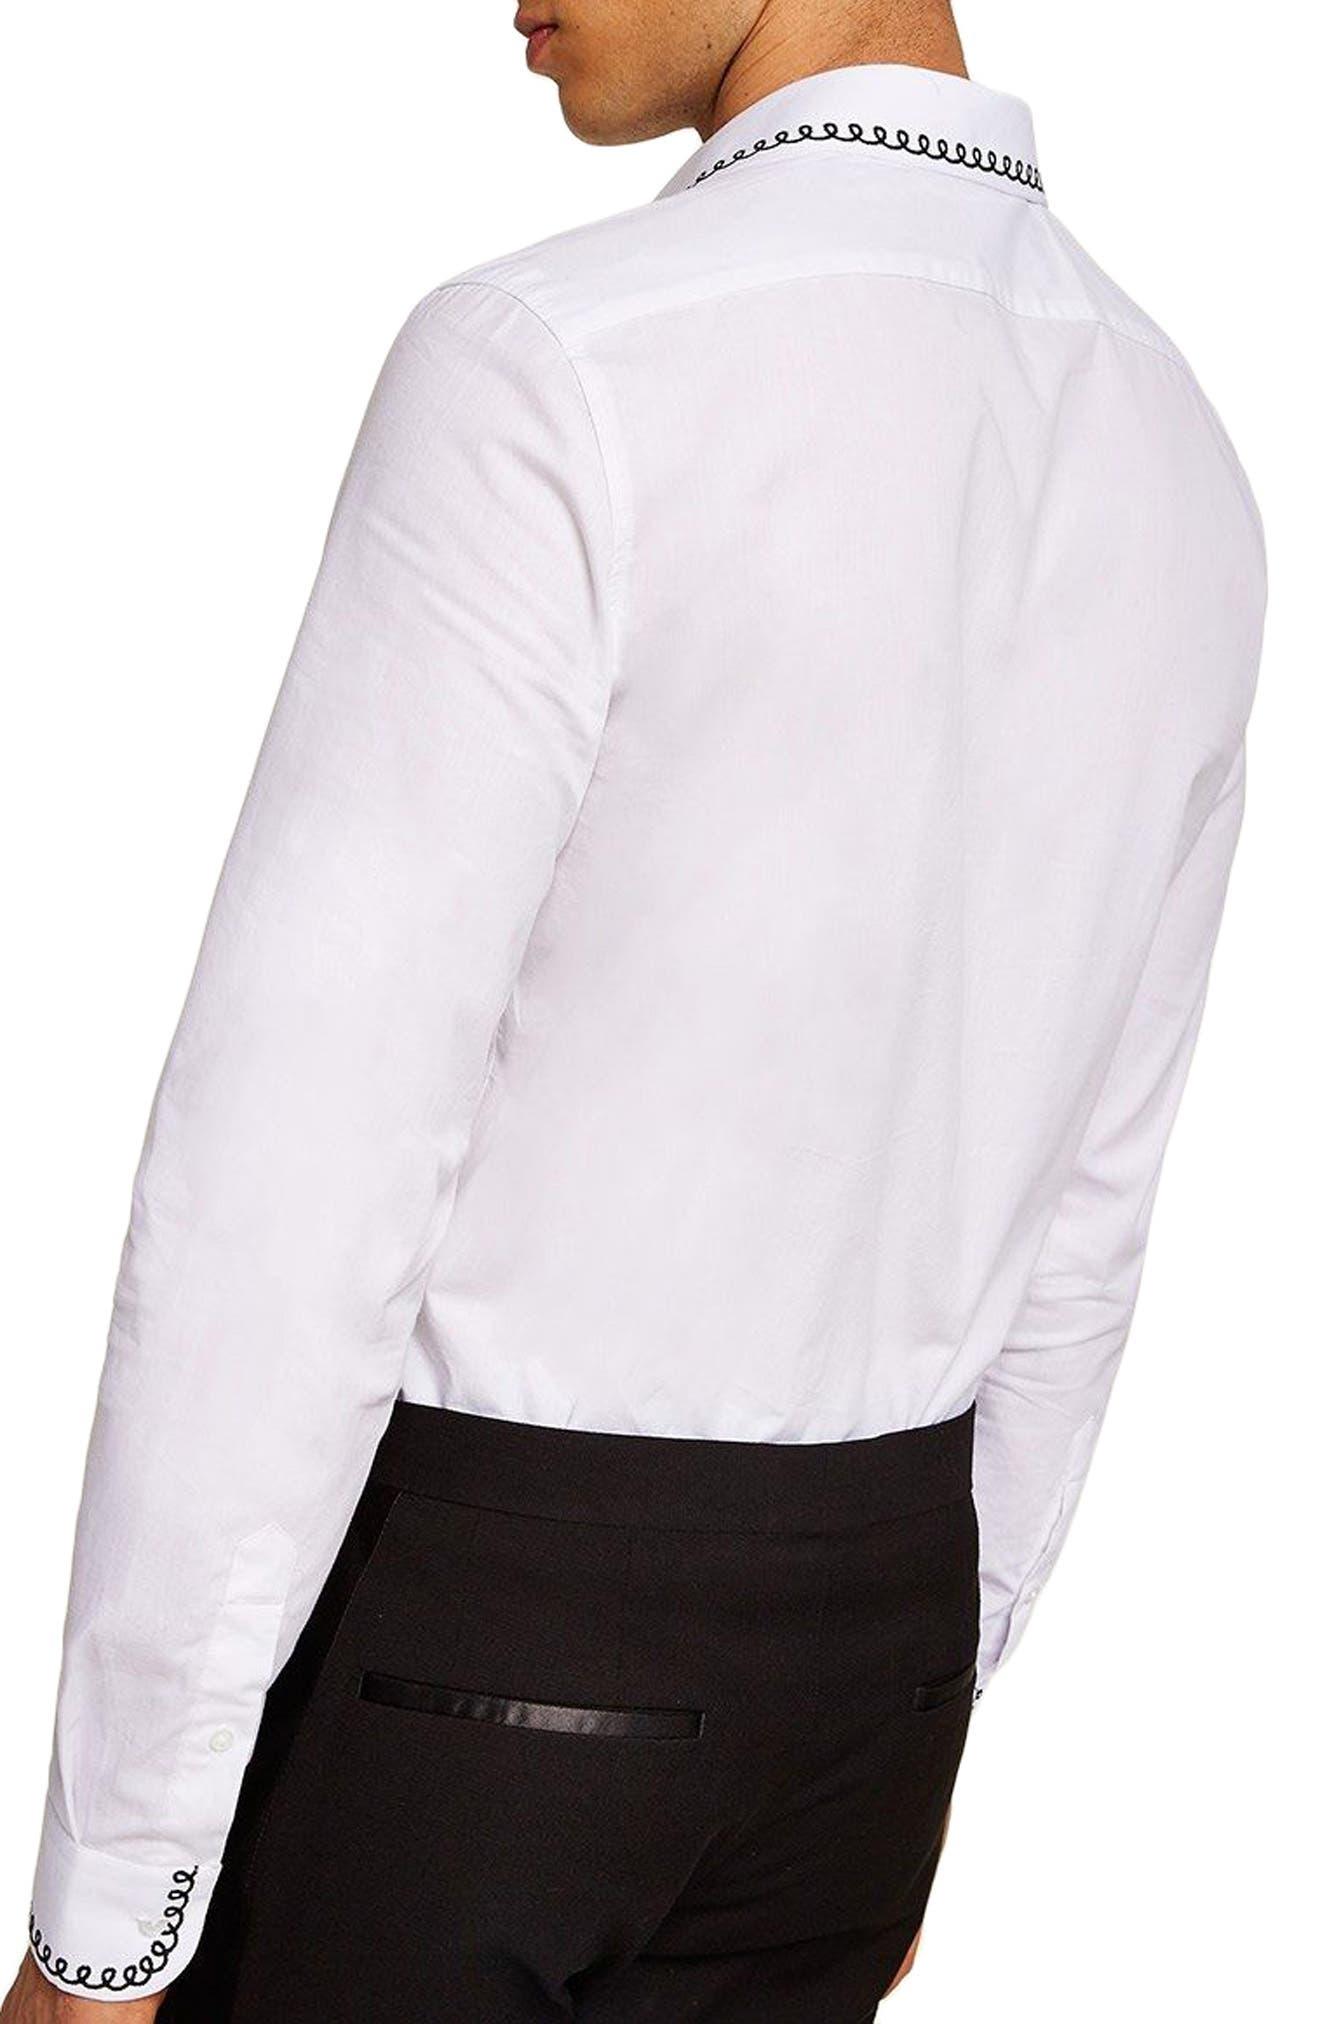 Phone Cable Dress Shirt,                             Alternate thumbnail 3, color,                             100